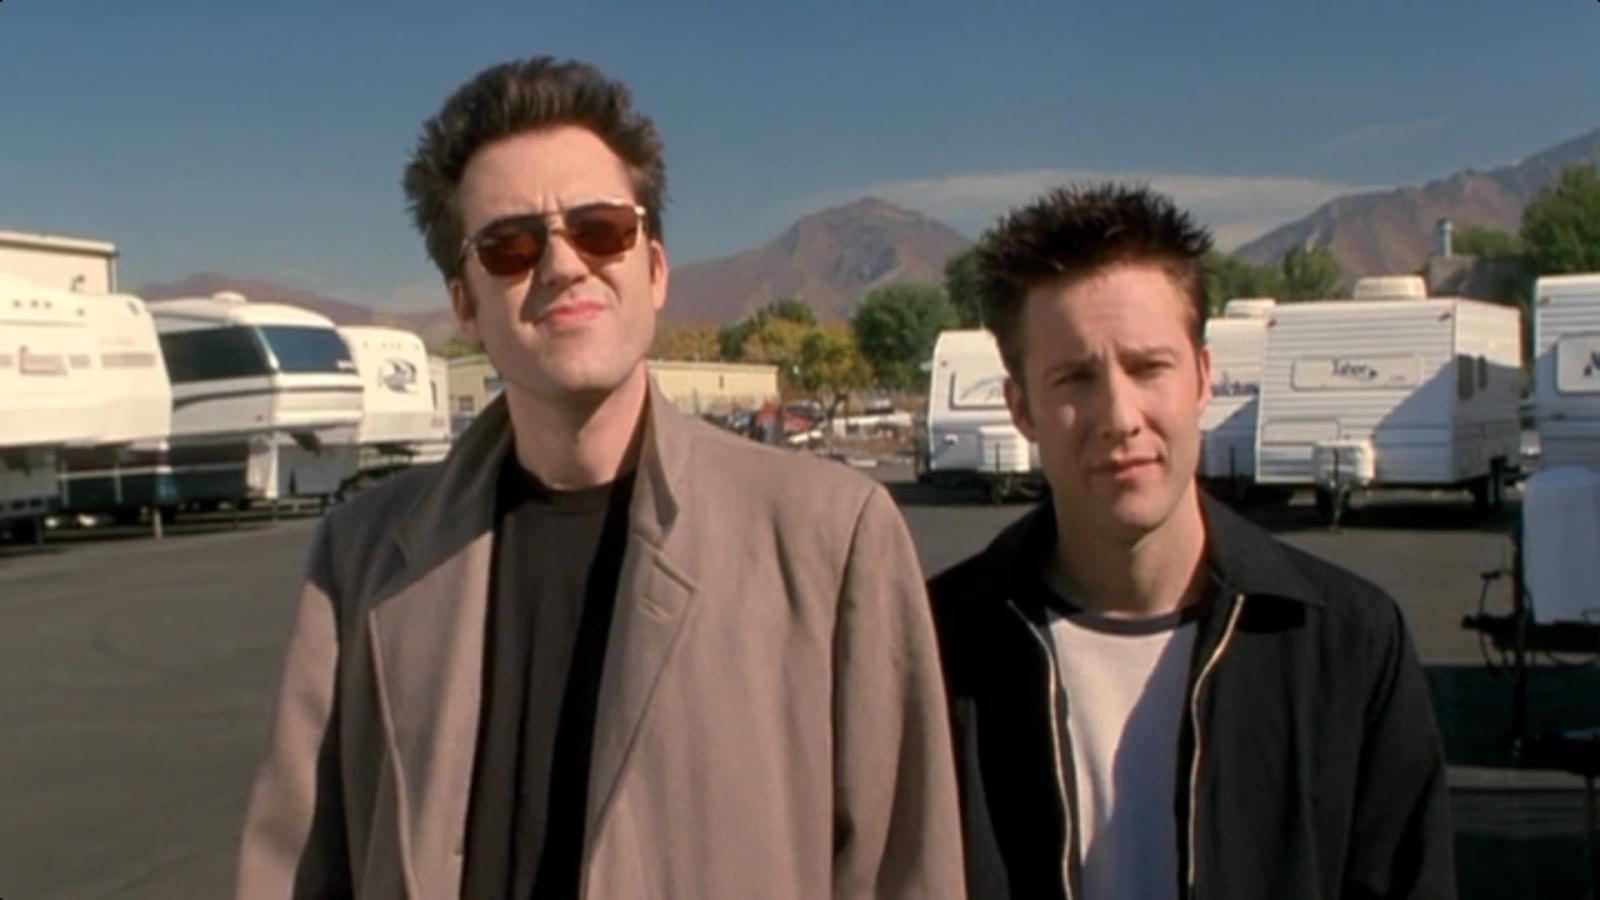 Mars Callahan and Michael Rosenbaum in Poolhall Junkies (2002)